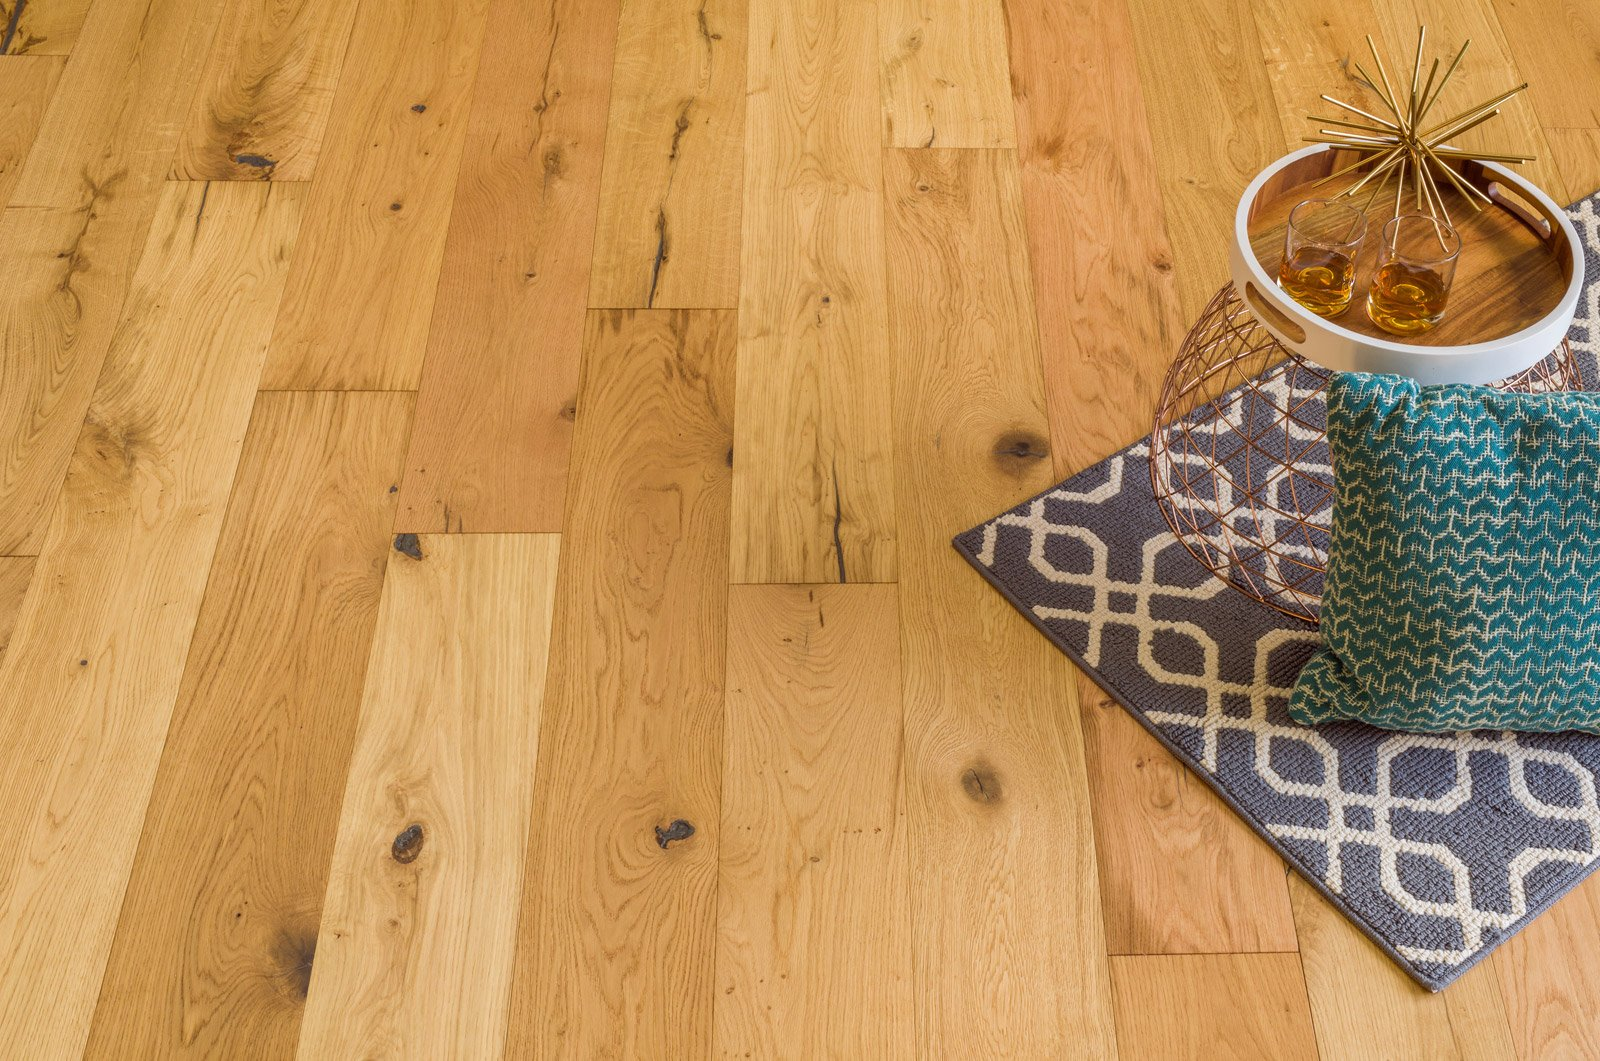 Hardwood Flooring Store In Washington Dc Get New Floors